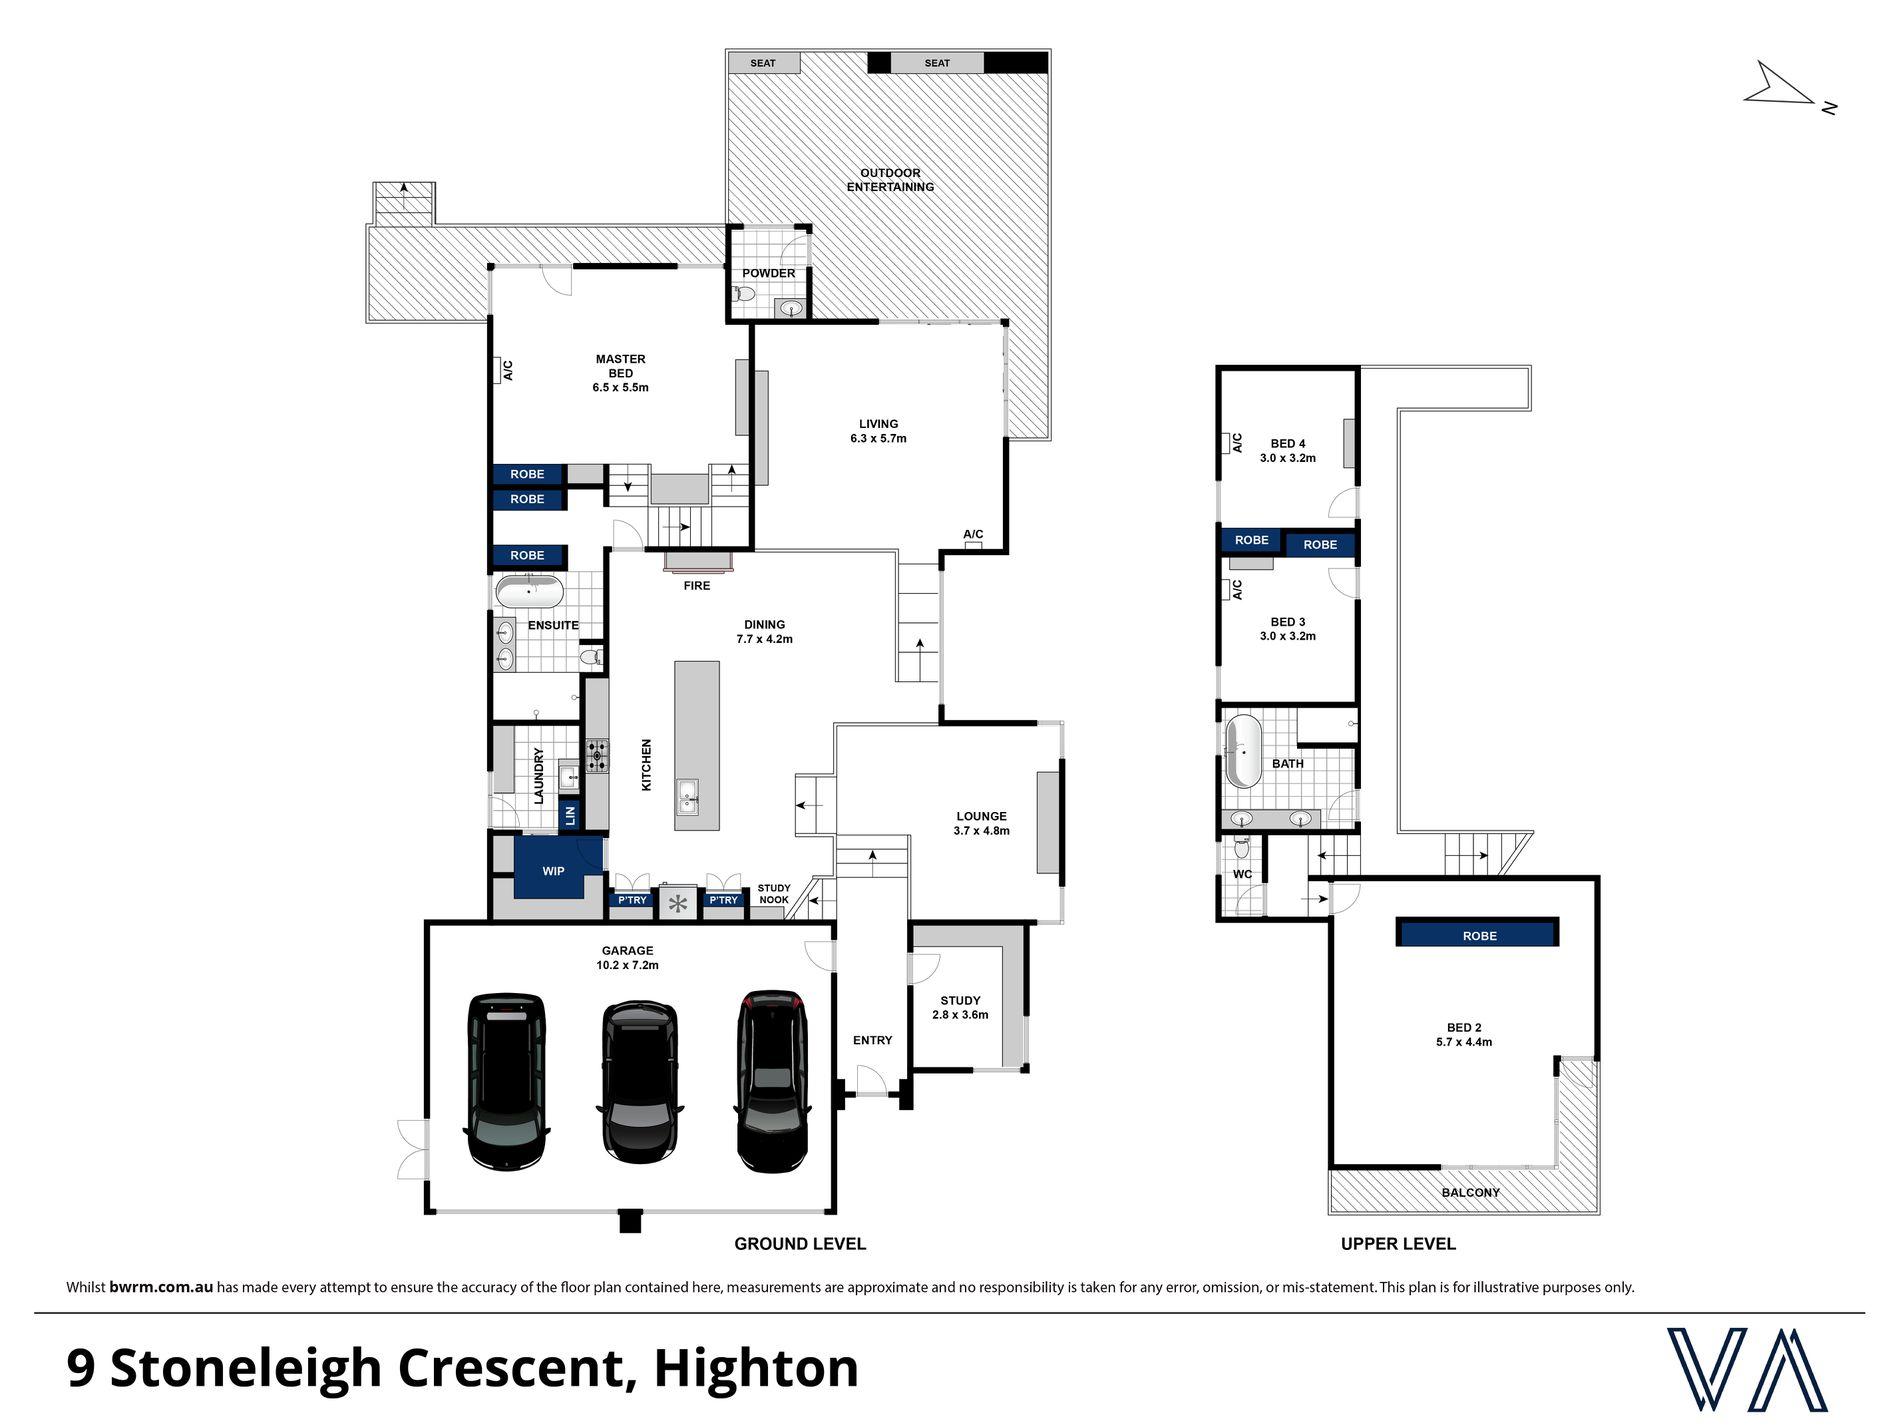 9 Stoneleigh Crescent, Highton